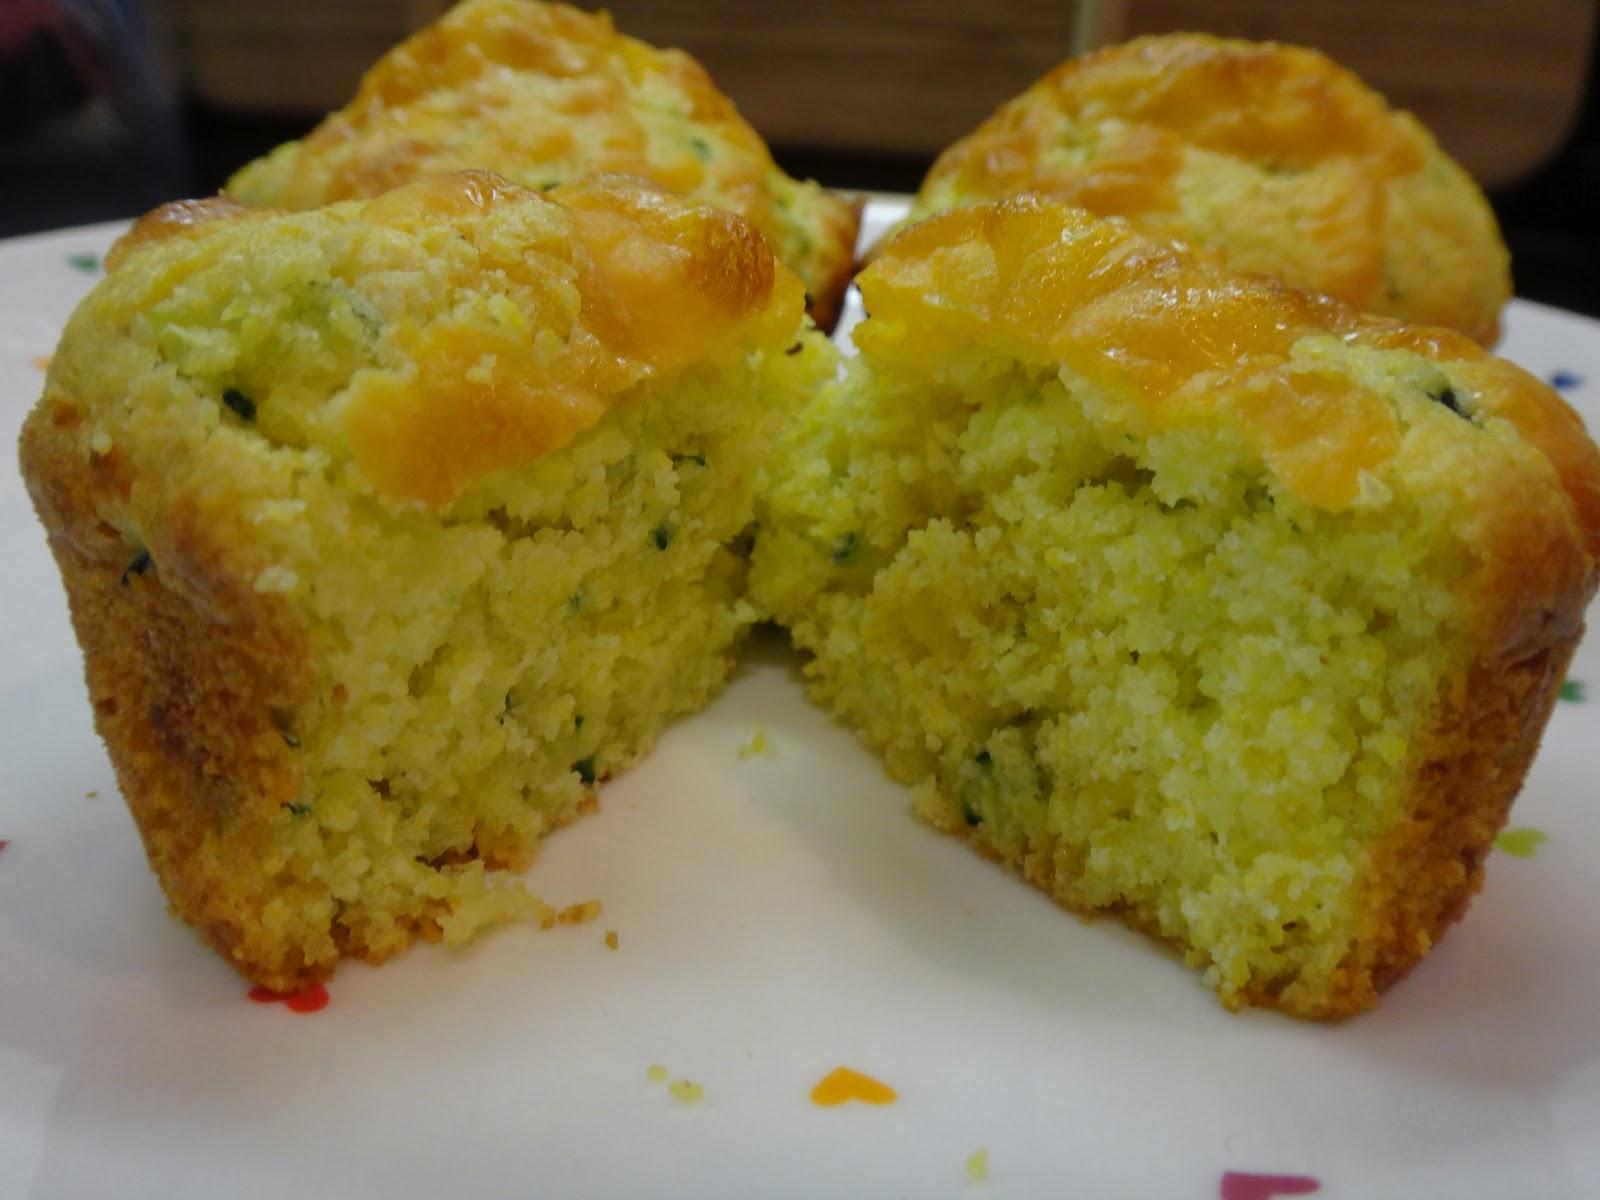 Falling in love with baking: Zucchini cornbread muffins